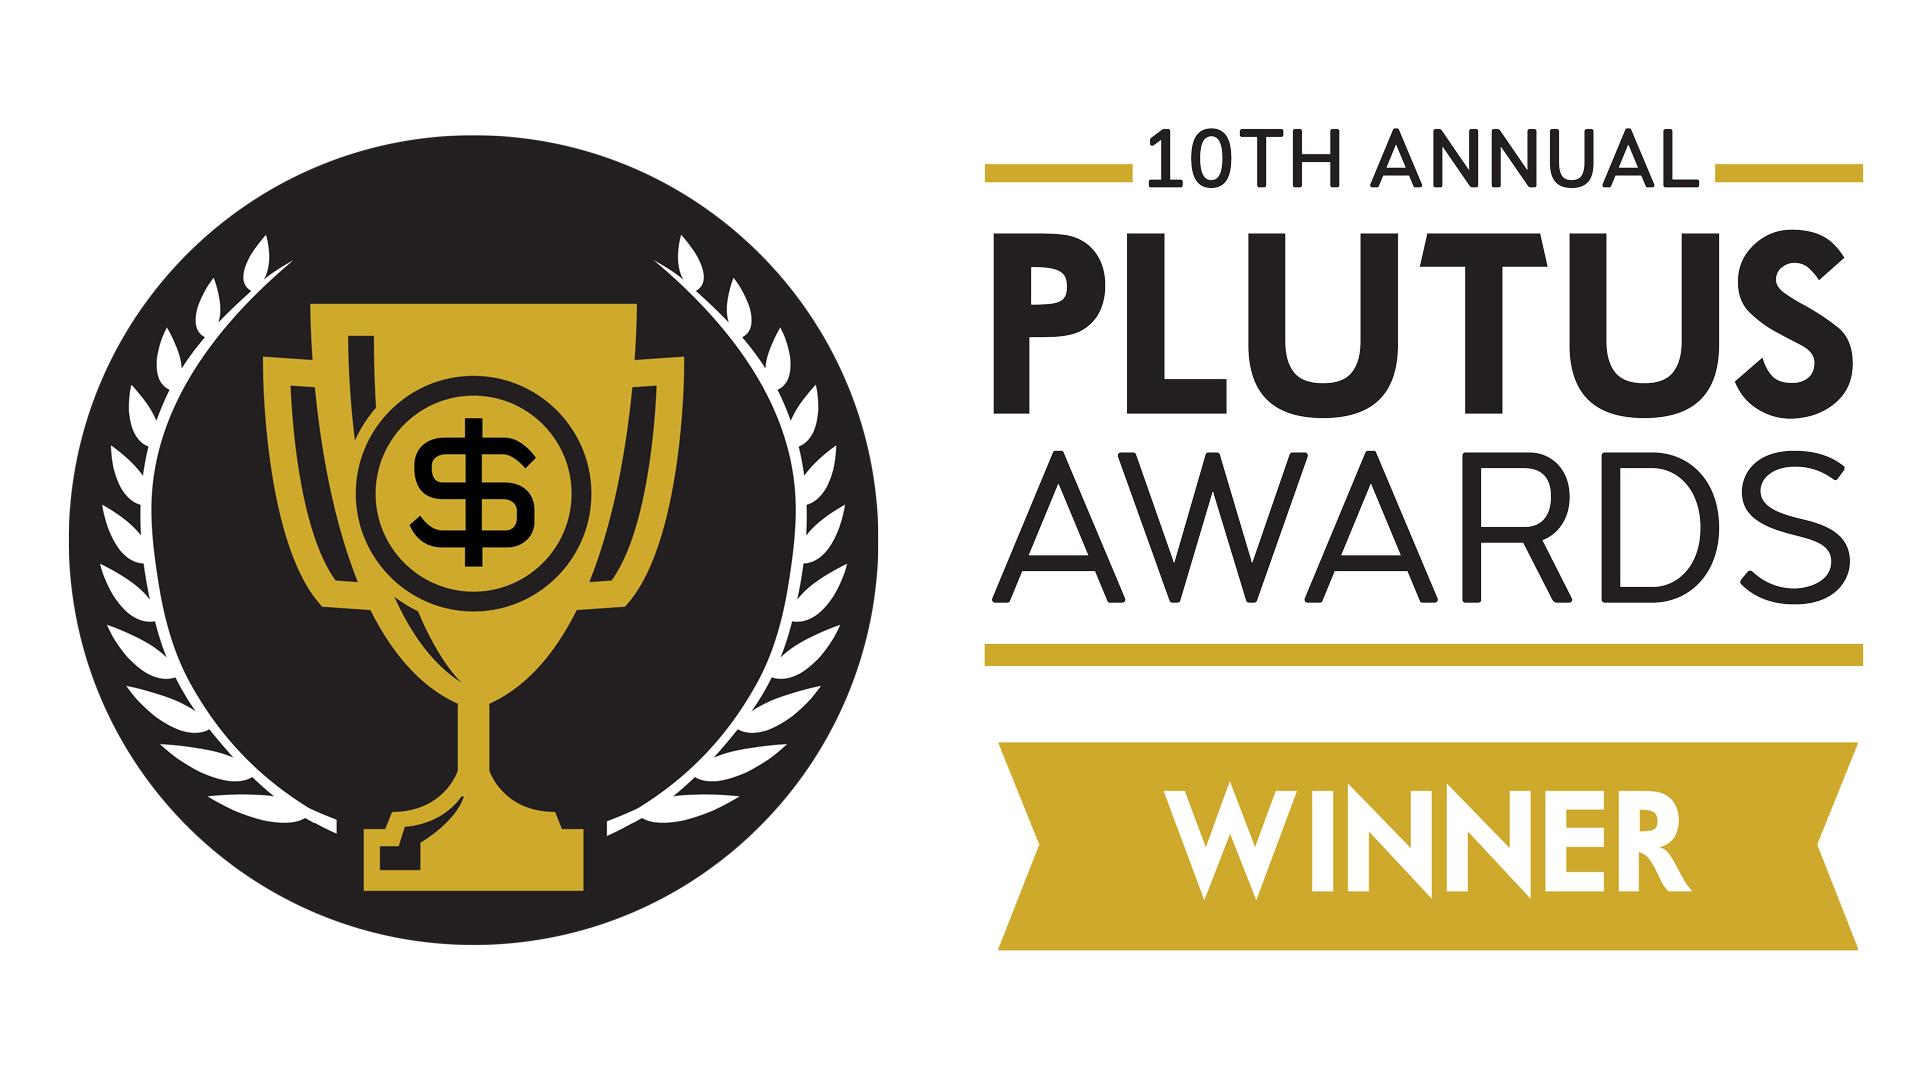 plutus-awards-winner-horizontal.jpg